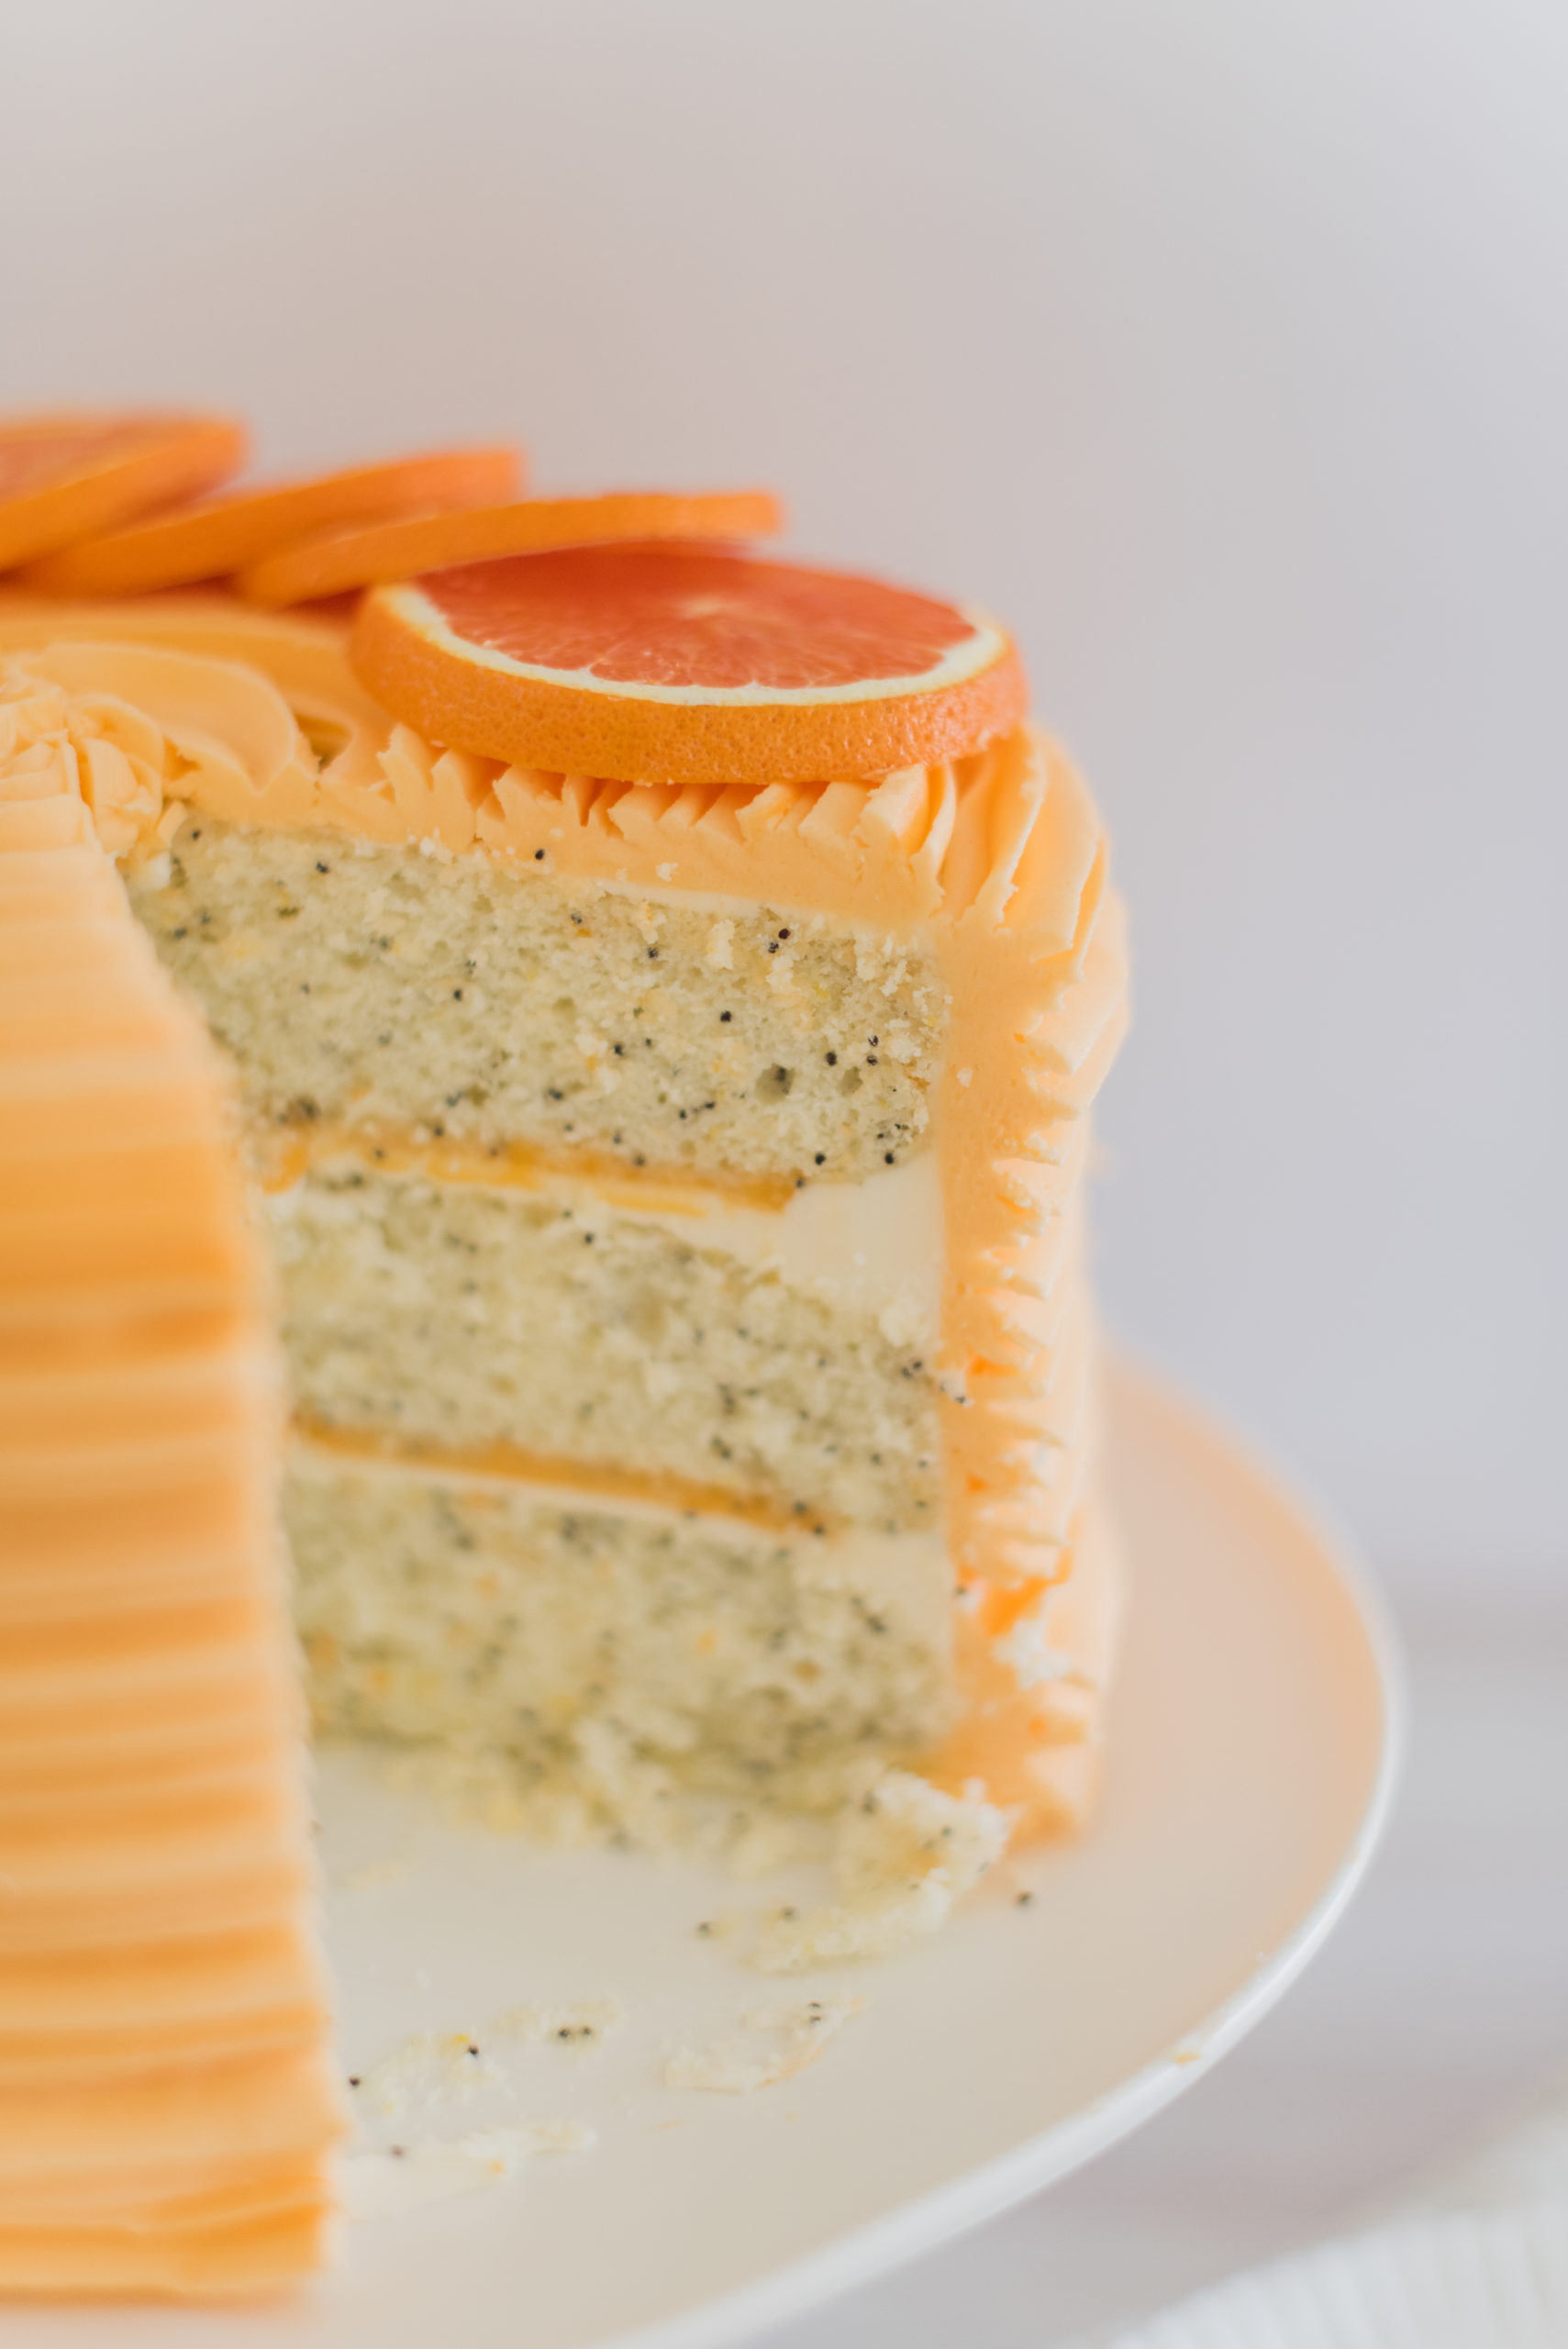 Orange Almond Poppy Seed Cake - light and fluffy poppy seed cake layers, infused with orange and almond flavoring, topped with almond buttercream and orange curd. #cakebycourtney #almondcake #almondpoppyseedcake #orangealmondpoppyseedcake #orangecurd #almondbuttercream #summercake #summerdessertrecipe #summerdessert #poppyseedcake #lightandfluffycake #cakedesign #cakerecipes #cakesforgirlsbirthday #cakeaesthetic #cakeideas #cakedecorating